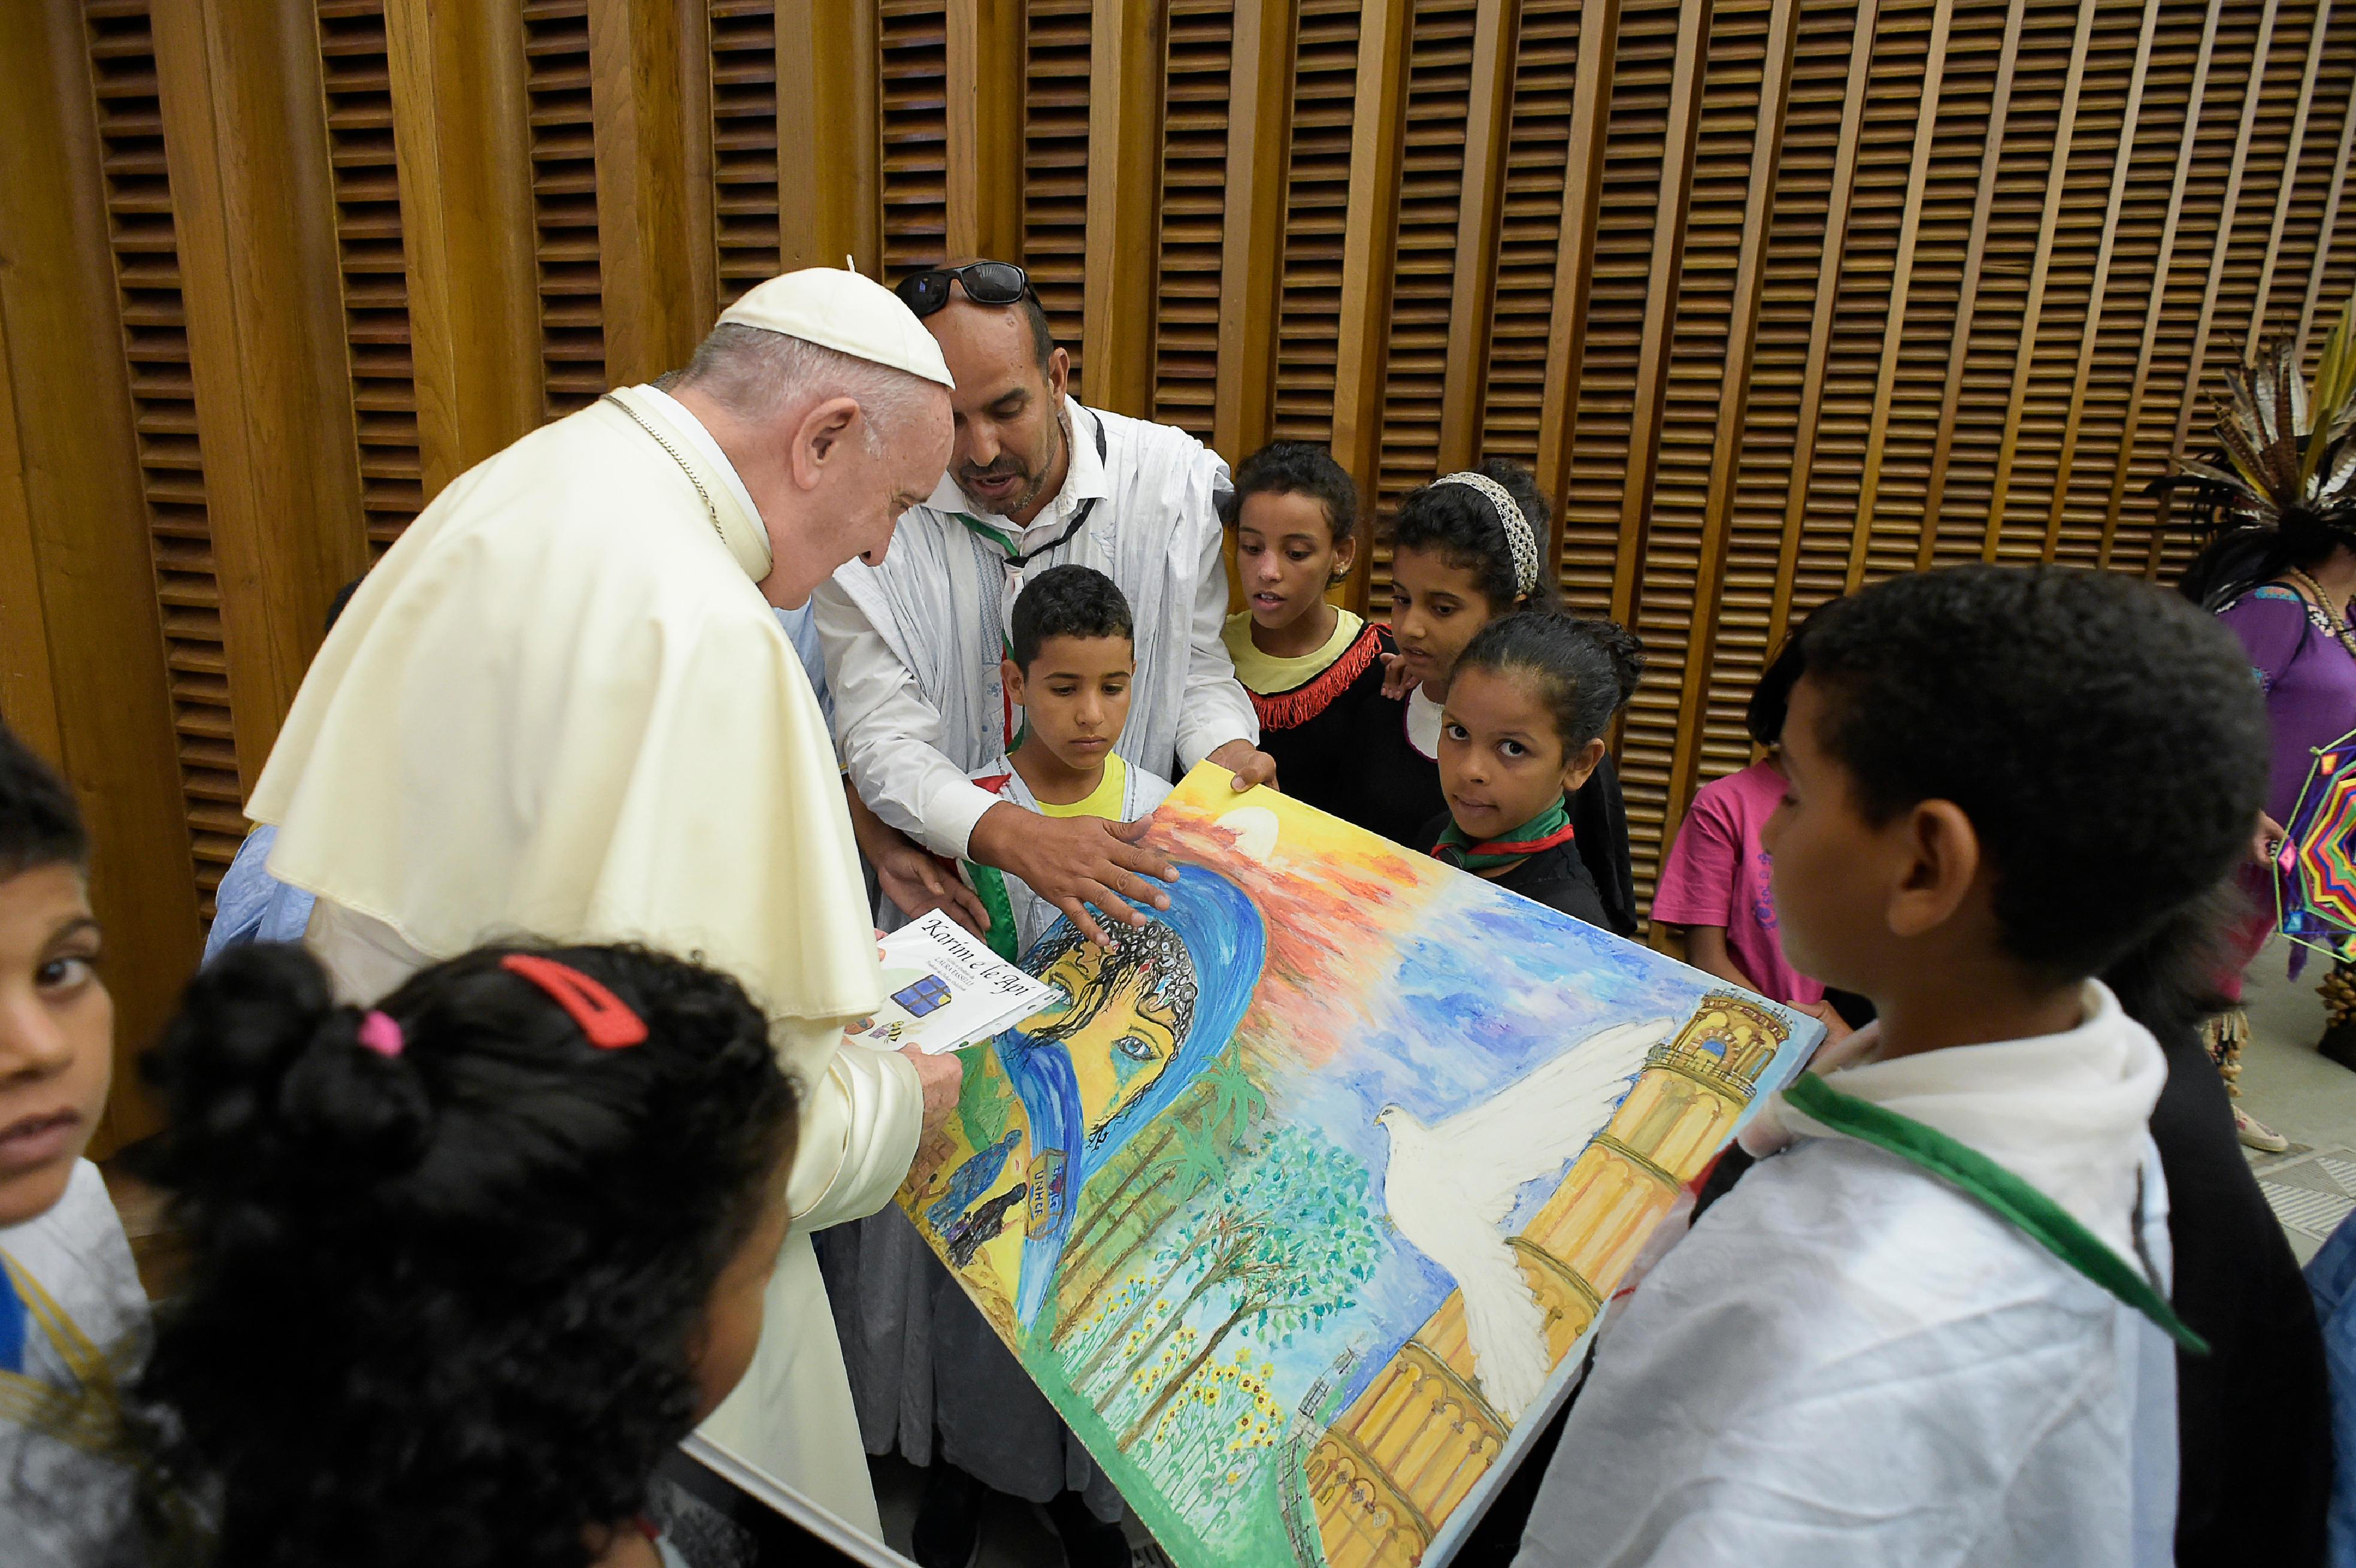 Enfants, audience du 8 août 2018 © Vatican Media